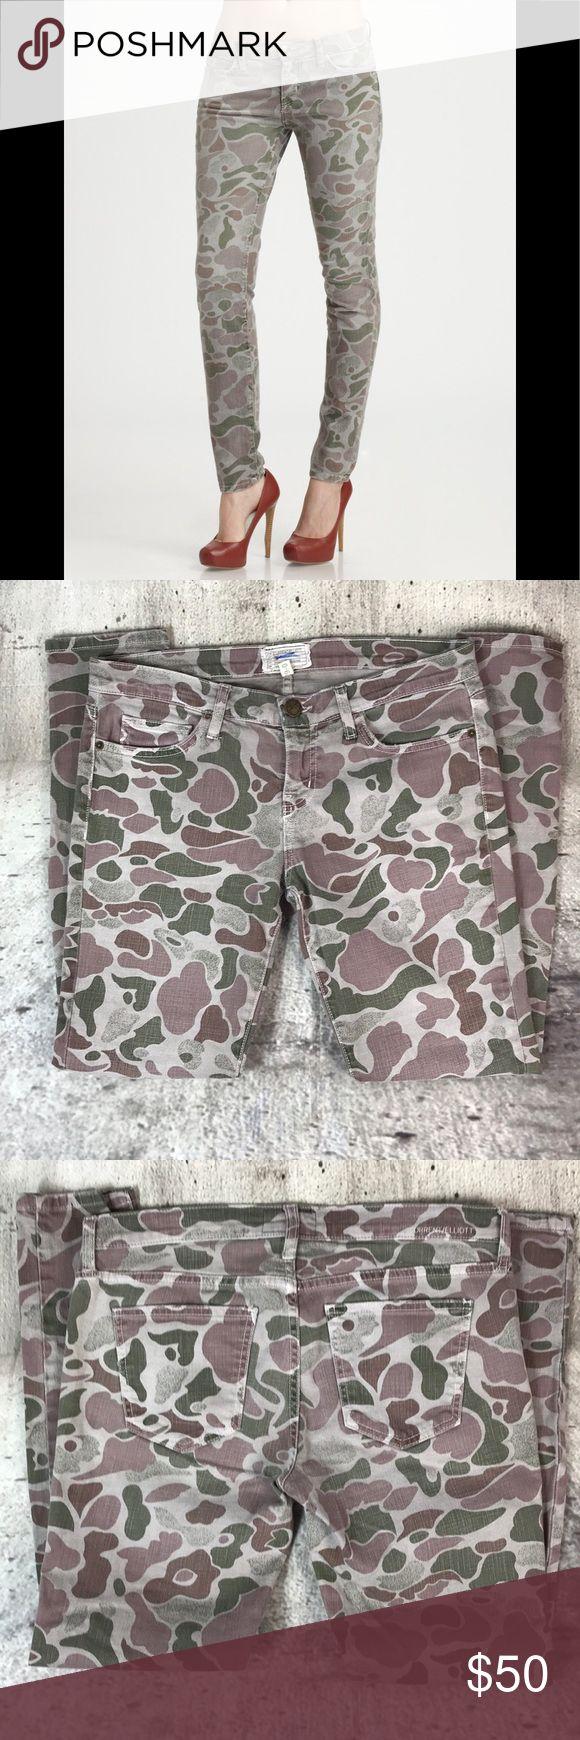 "Current Elliott Camo skinny jeans Current Elliott Camo skinny jeans cotton and spandex blend inseam 29"" rise 8.5"" Anthropologie Jeans Skinny"